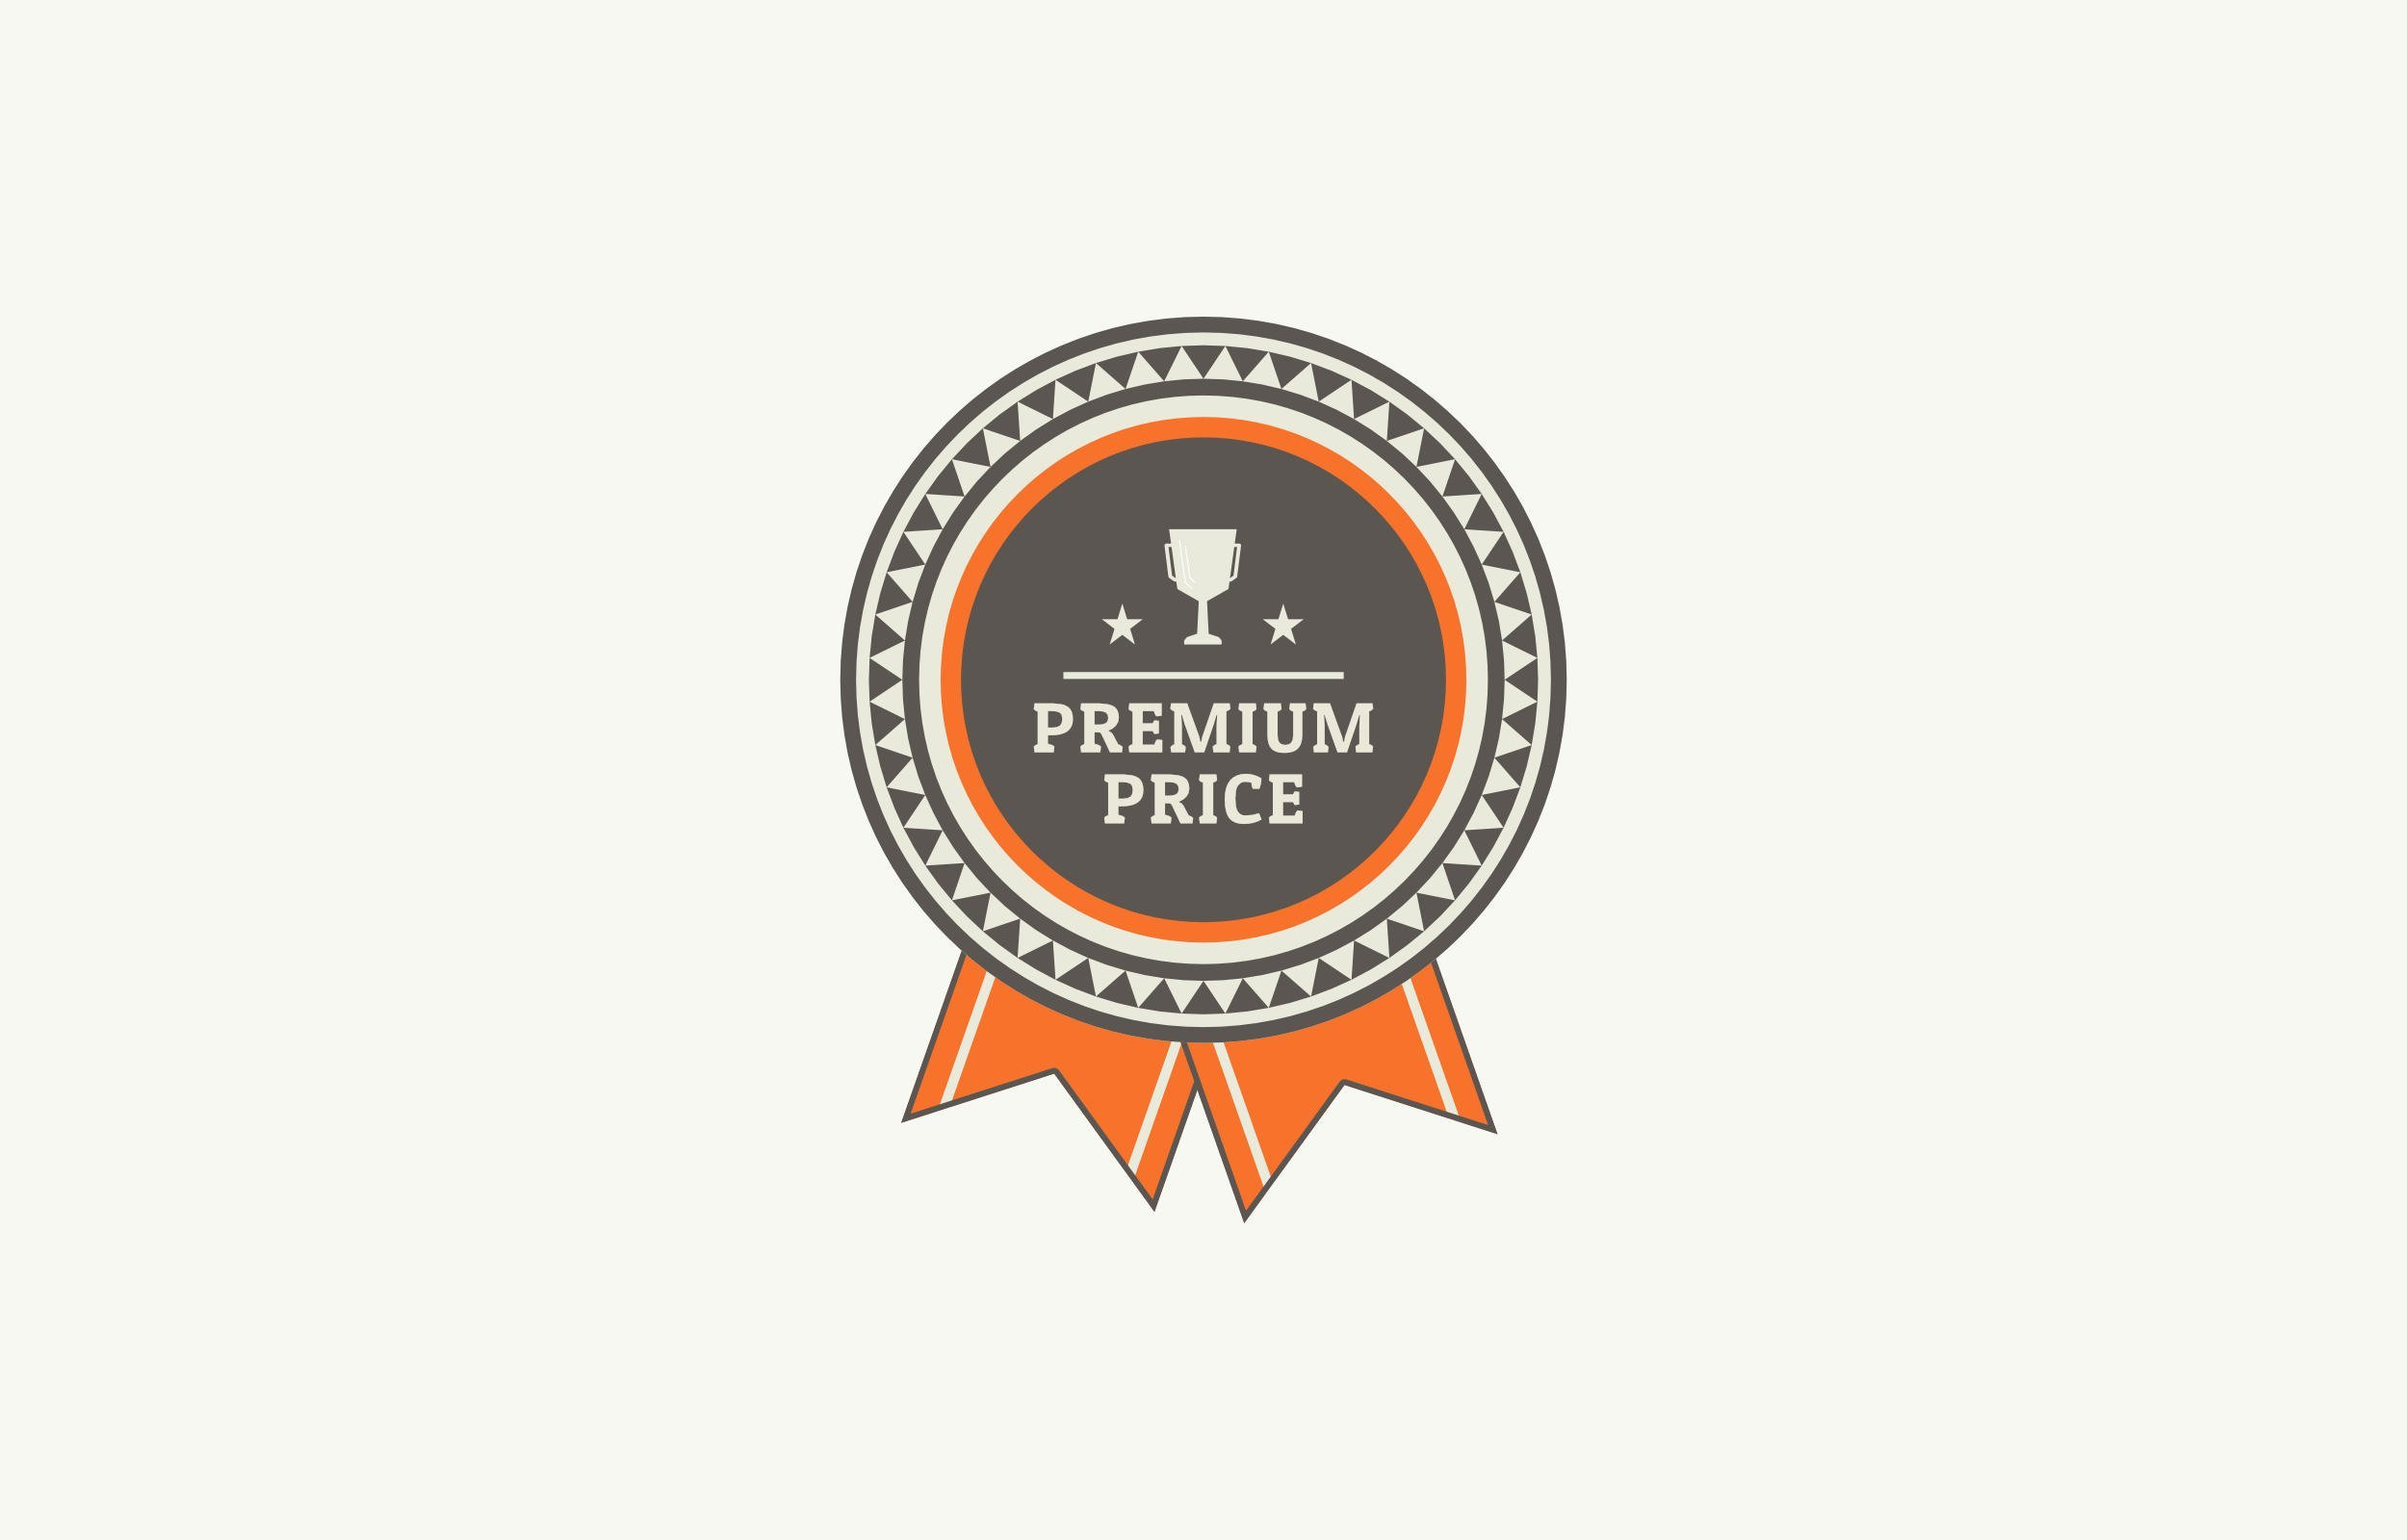 How To Create a Price Badge Design in Affinity Designer